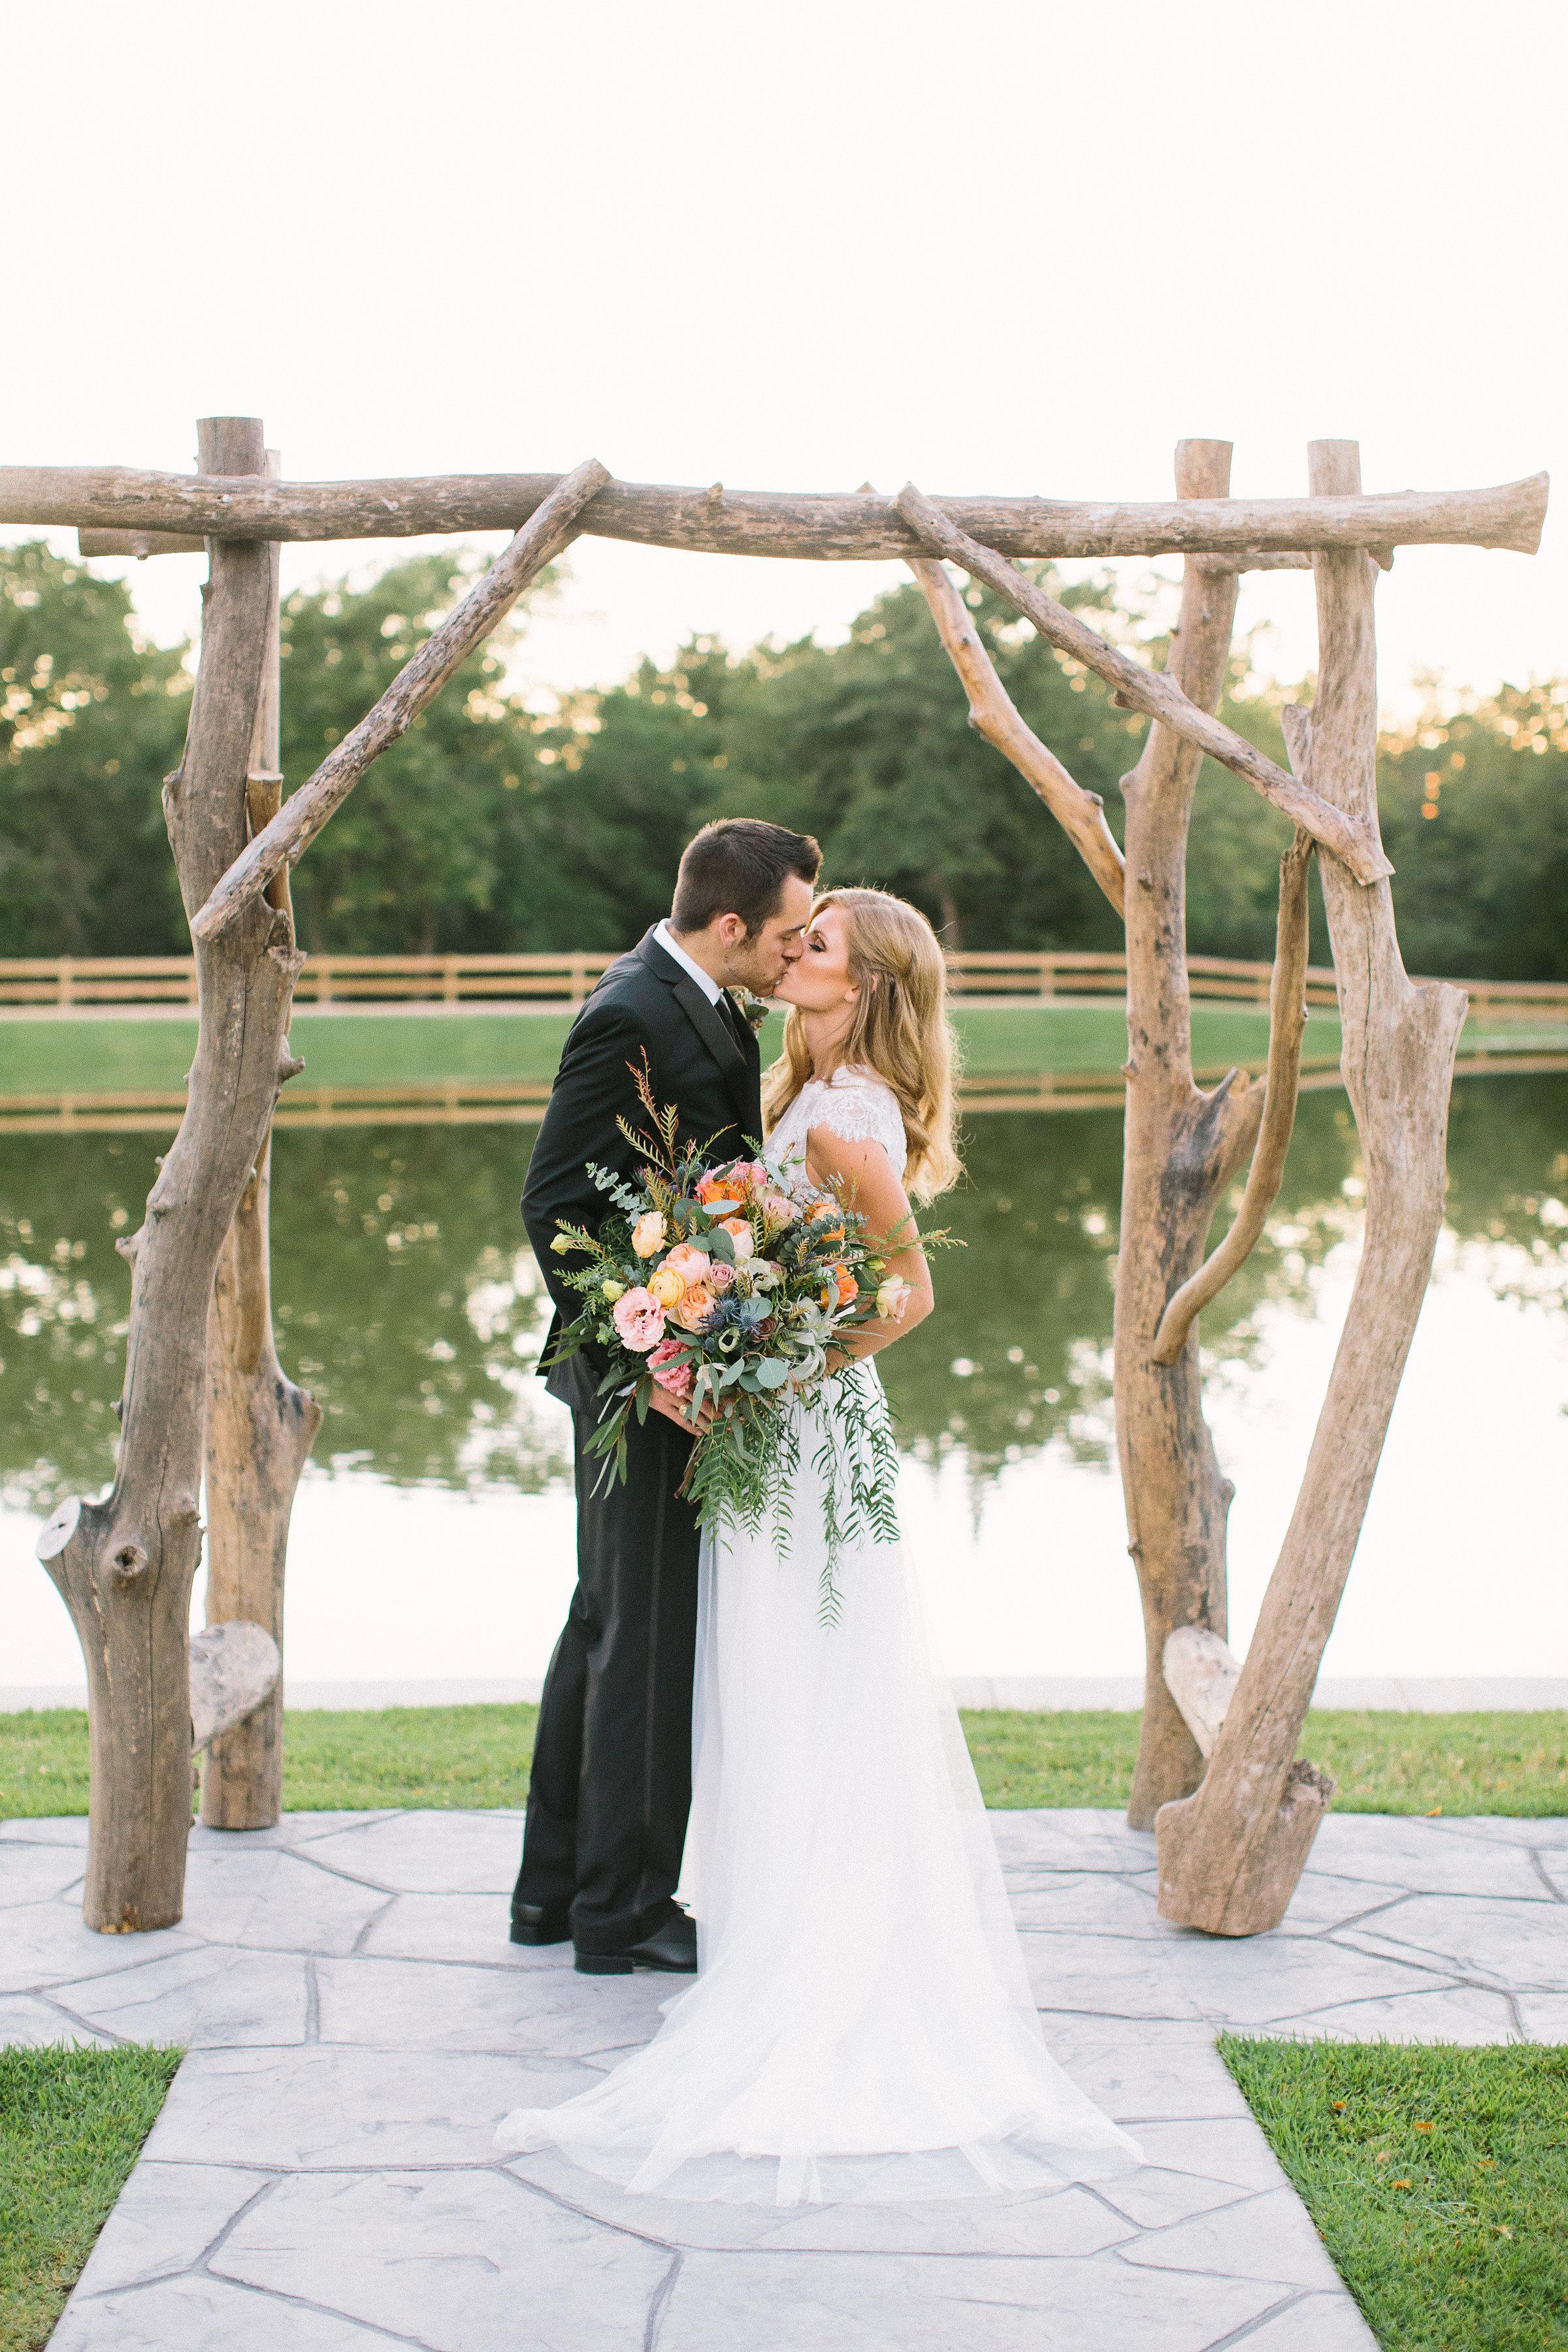 Ellen-Ashton-Photography-Peach-Creek-Ranch-Weddings-Wed-and-Prosper393